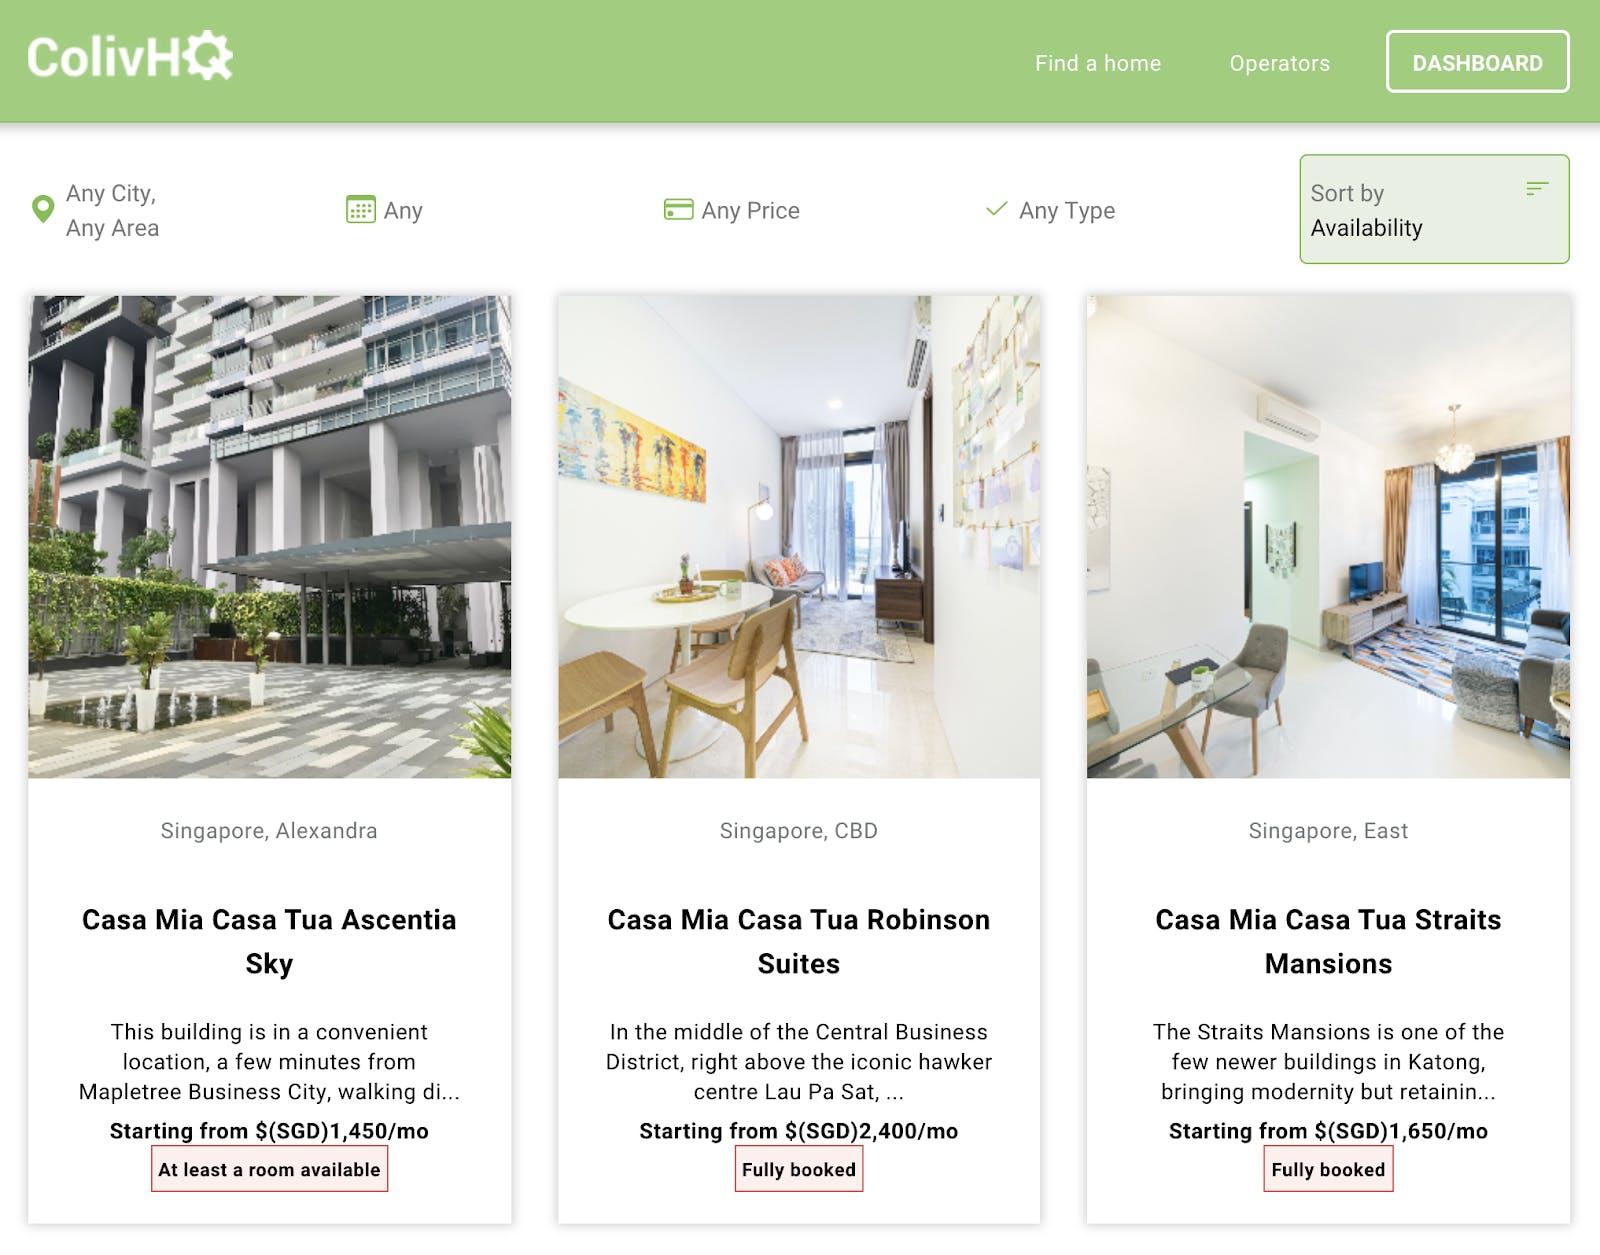 Homes listed on ColivHQ.com